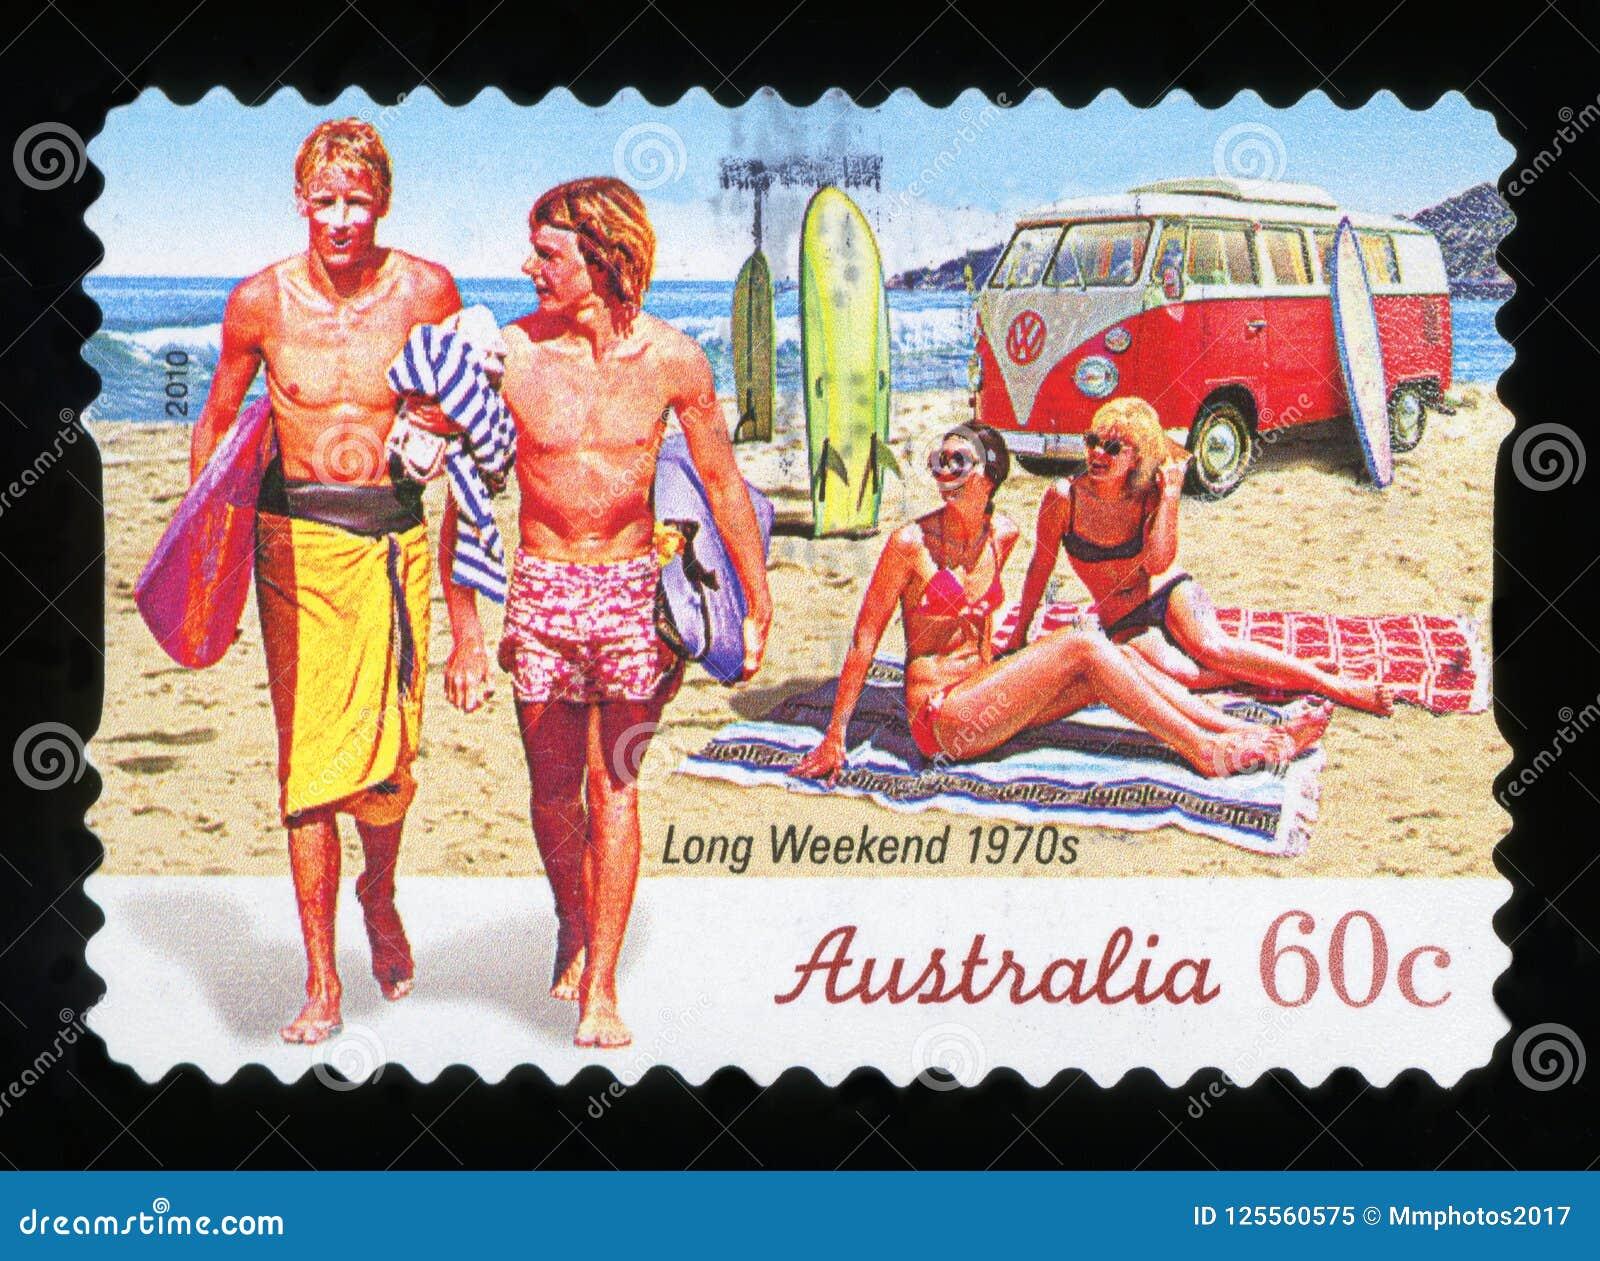 AUSTRALIA - postage stamp